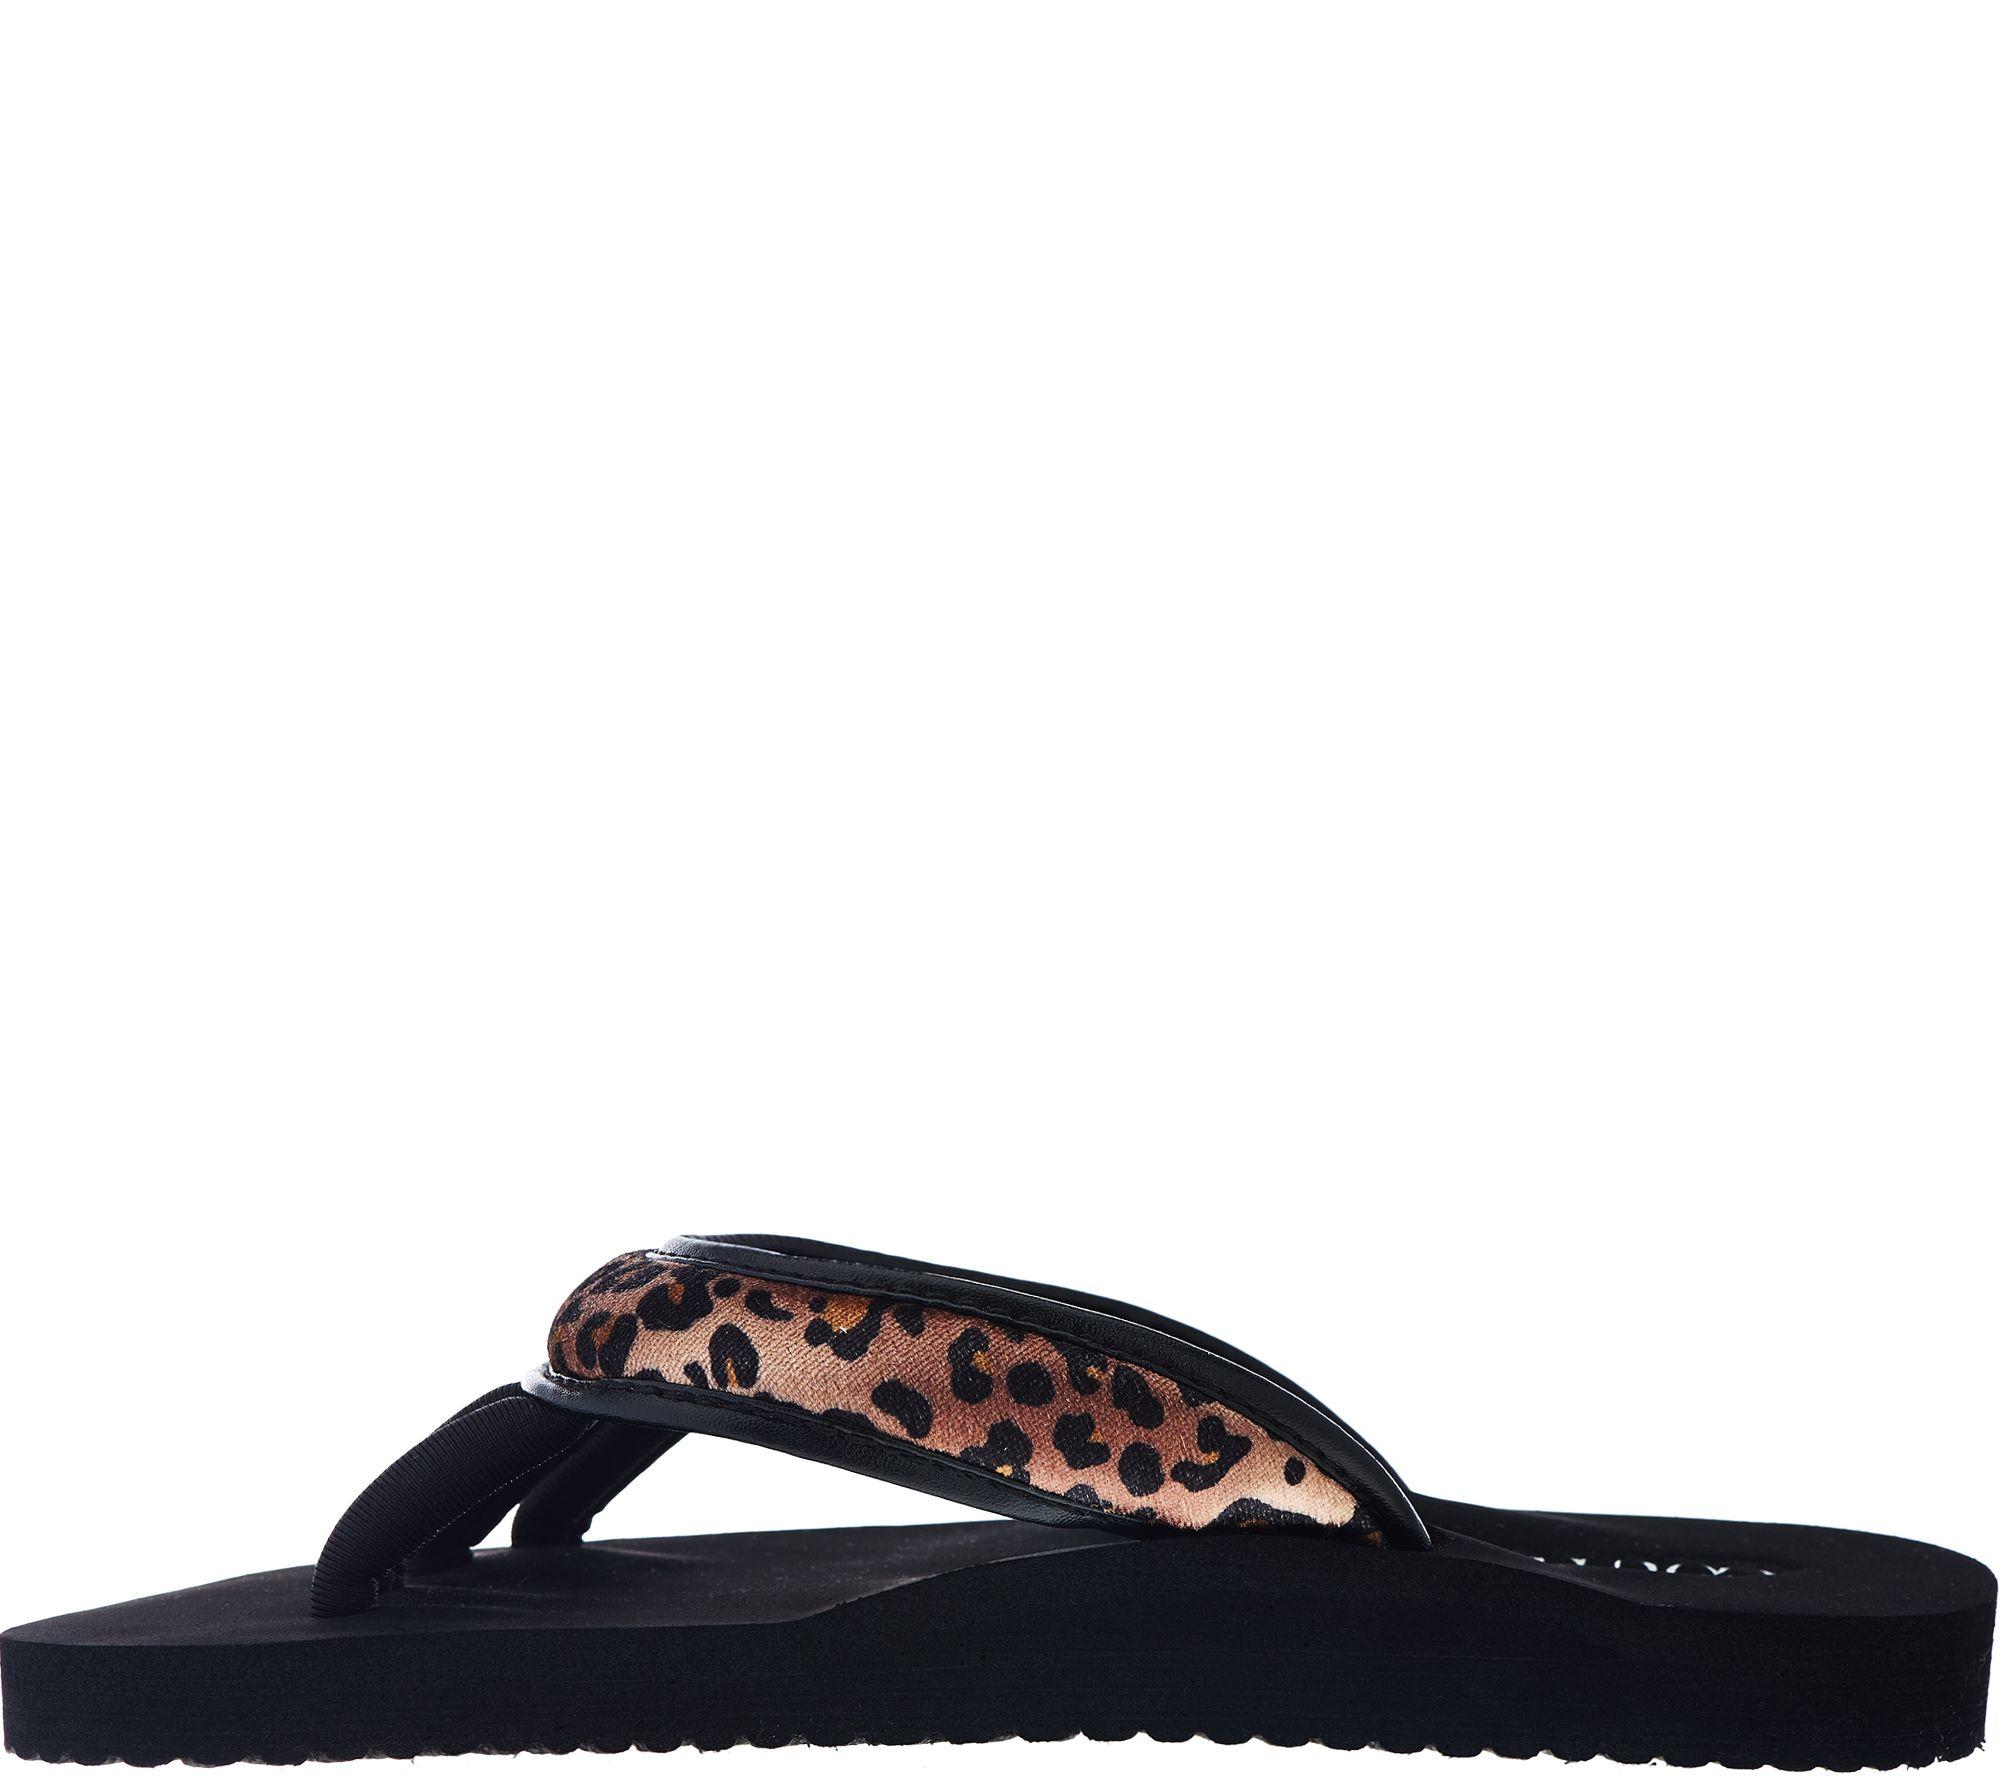 5a1b8c38f6c69 Pedi Couture On-the-Go Pedicure Sandal - Page 1 — QVC.com